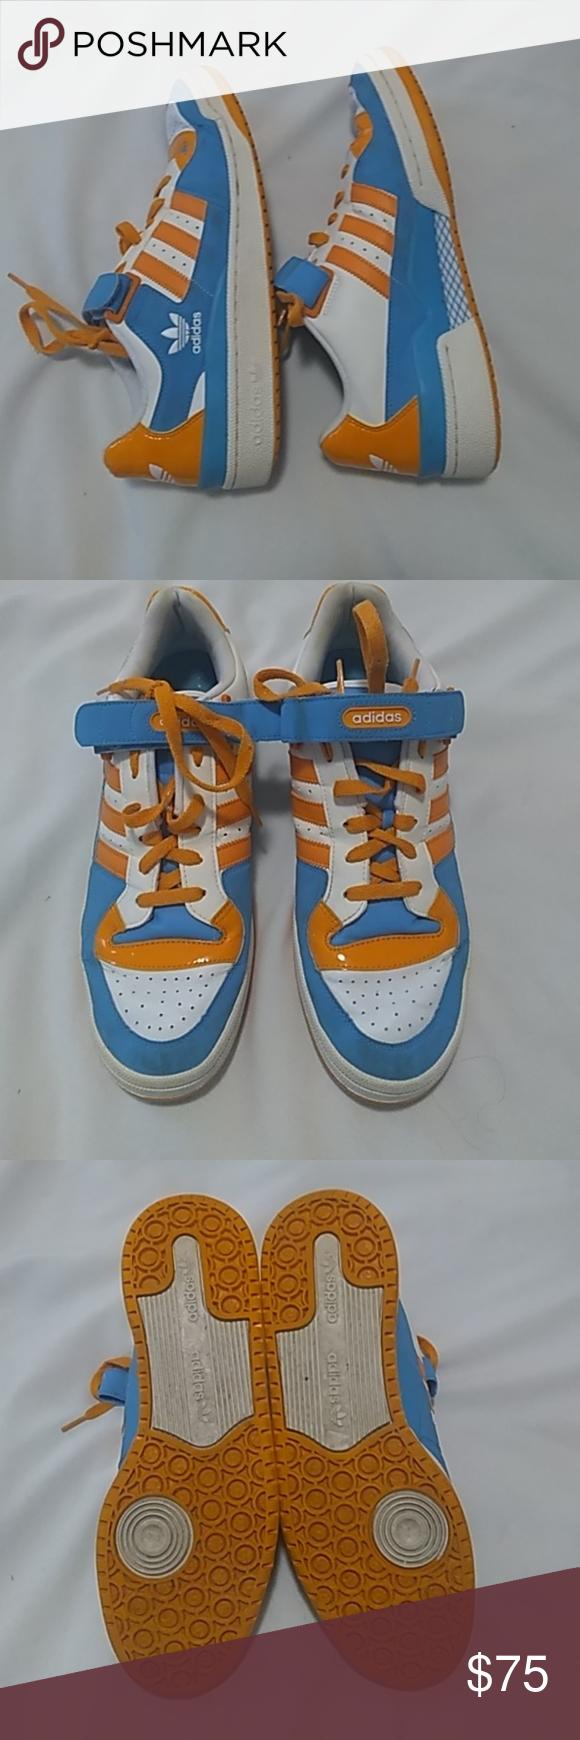 bota Congelar densidad  🖤 Adidas🖤 sneakers | Adidas sneakers, Shoes sneakers adidas, Adidas